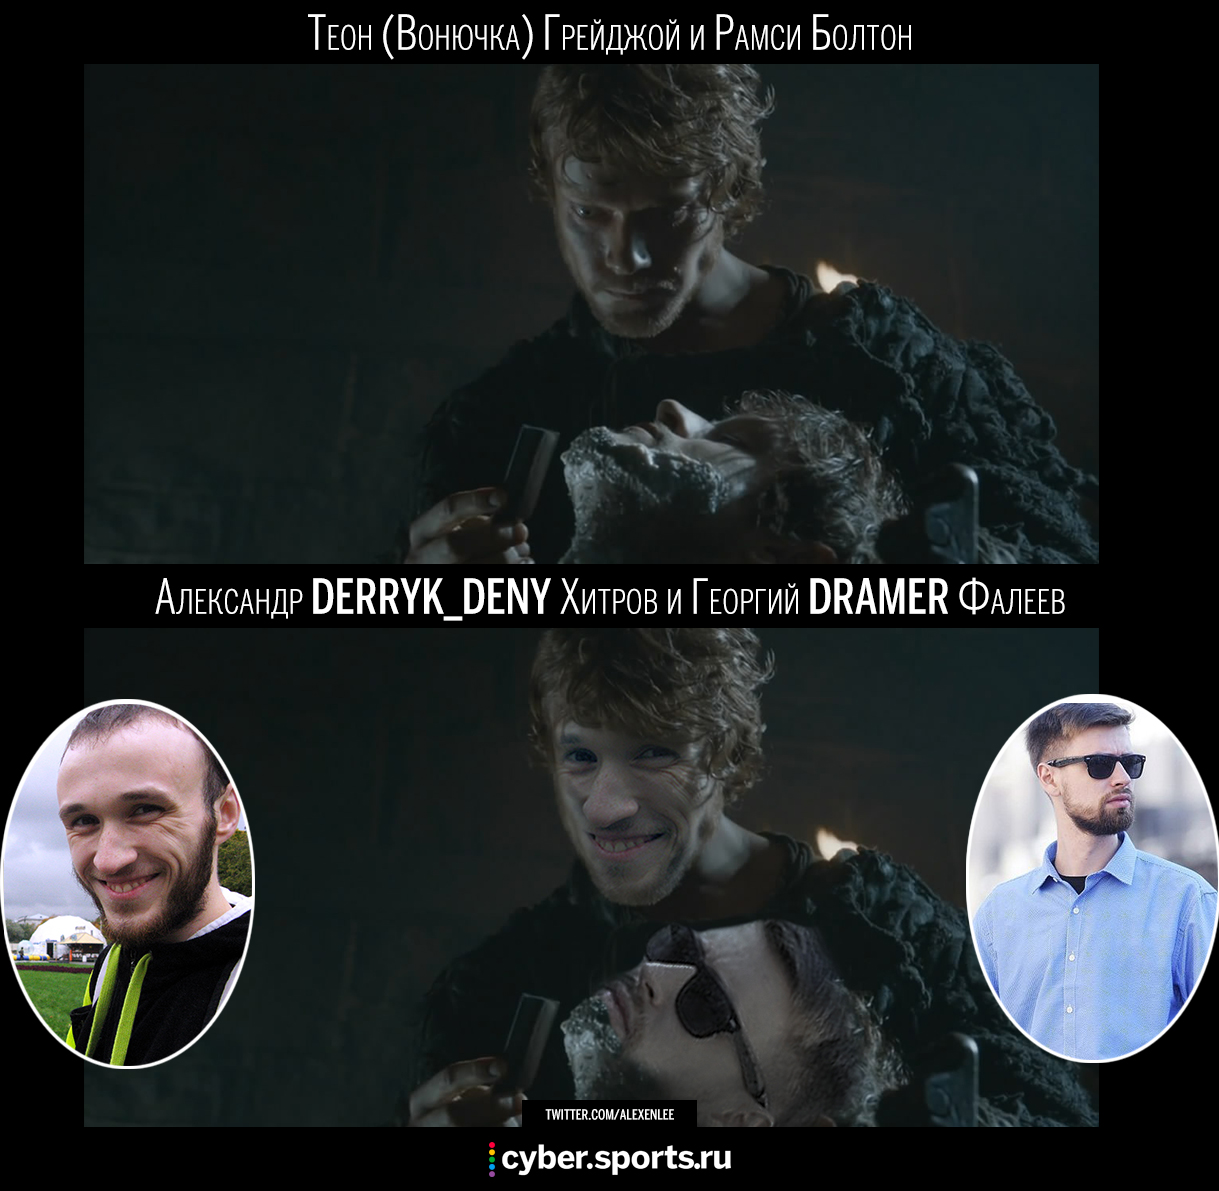 Александр derryk_deny Хитров